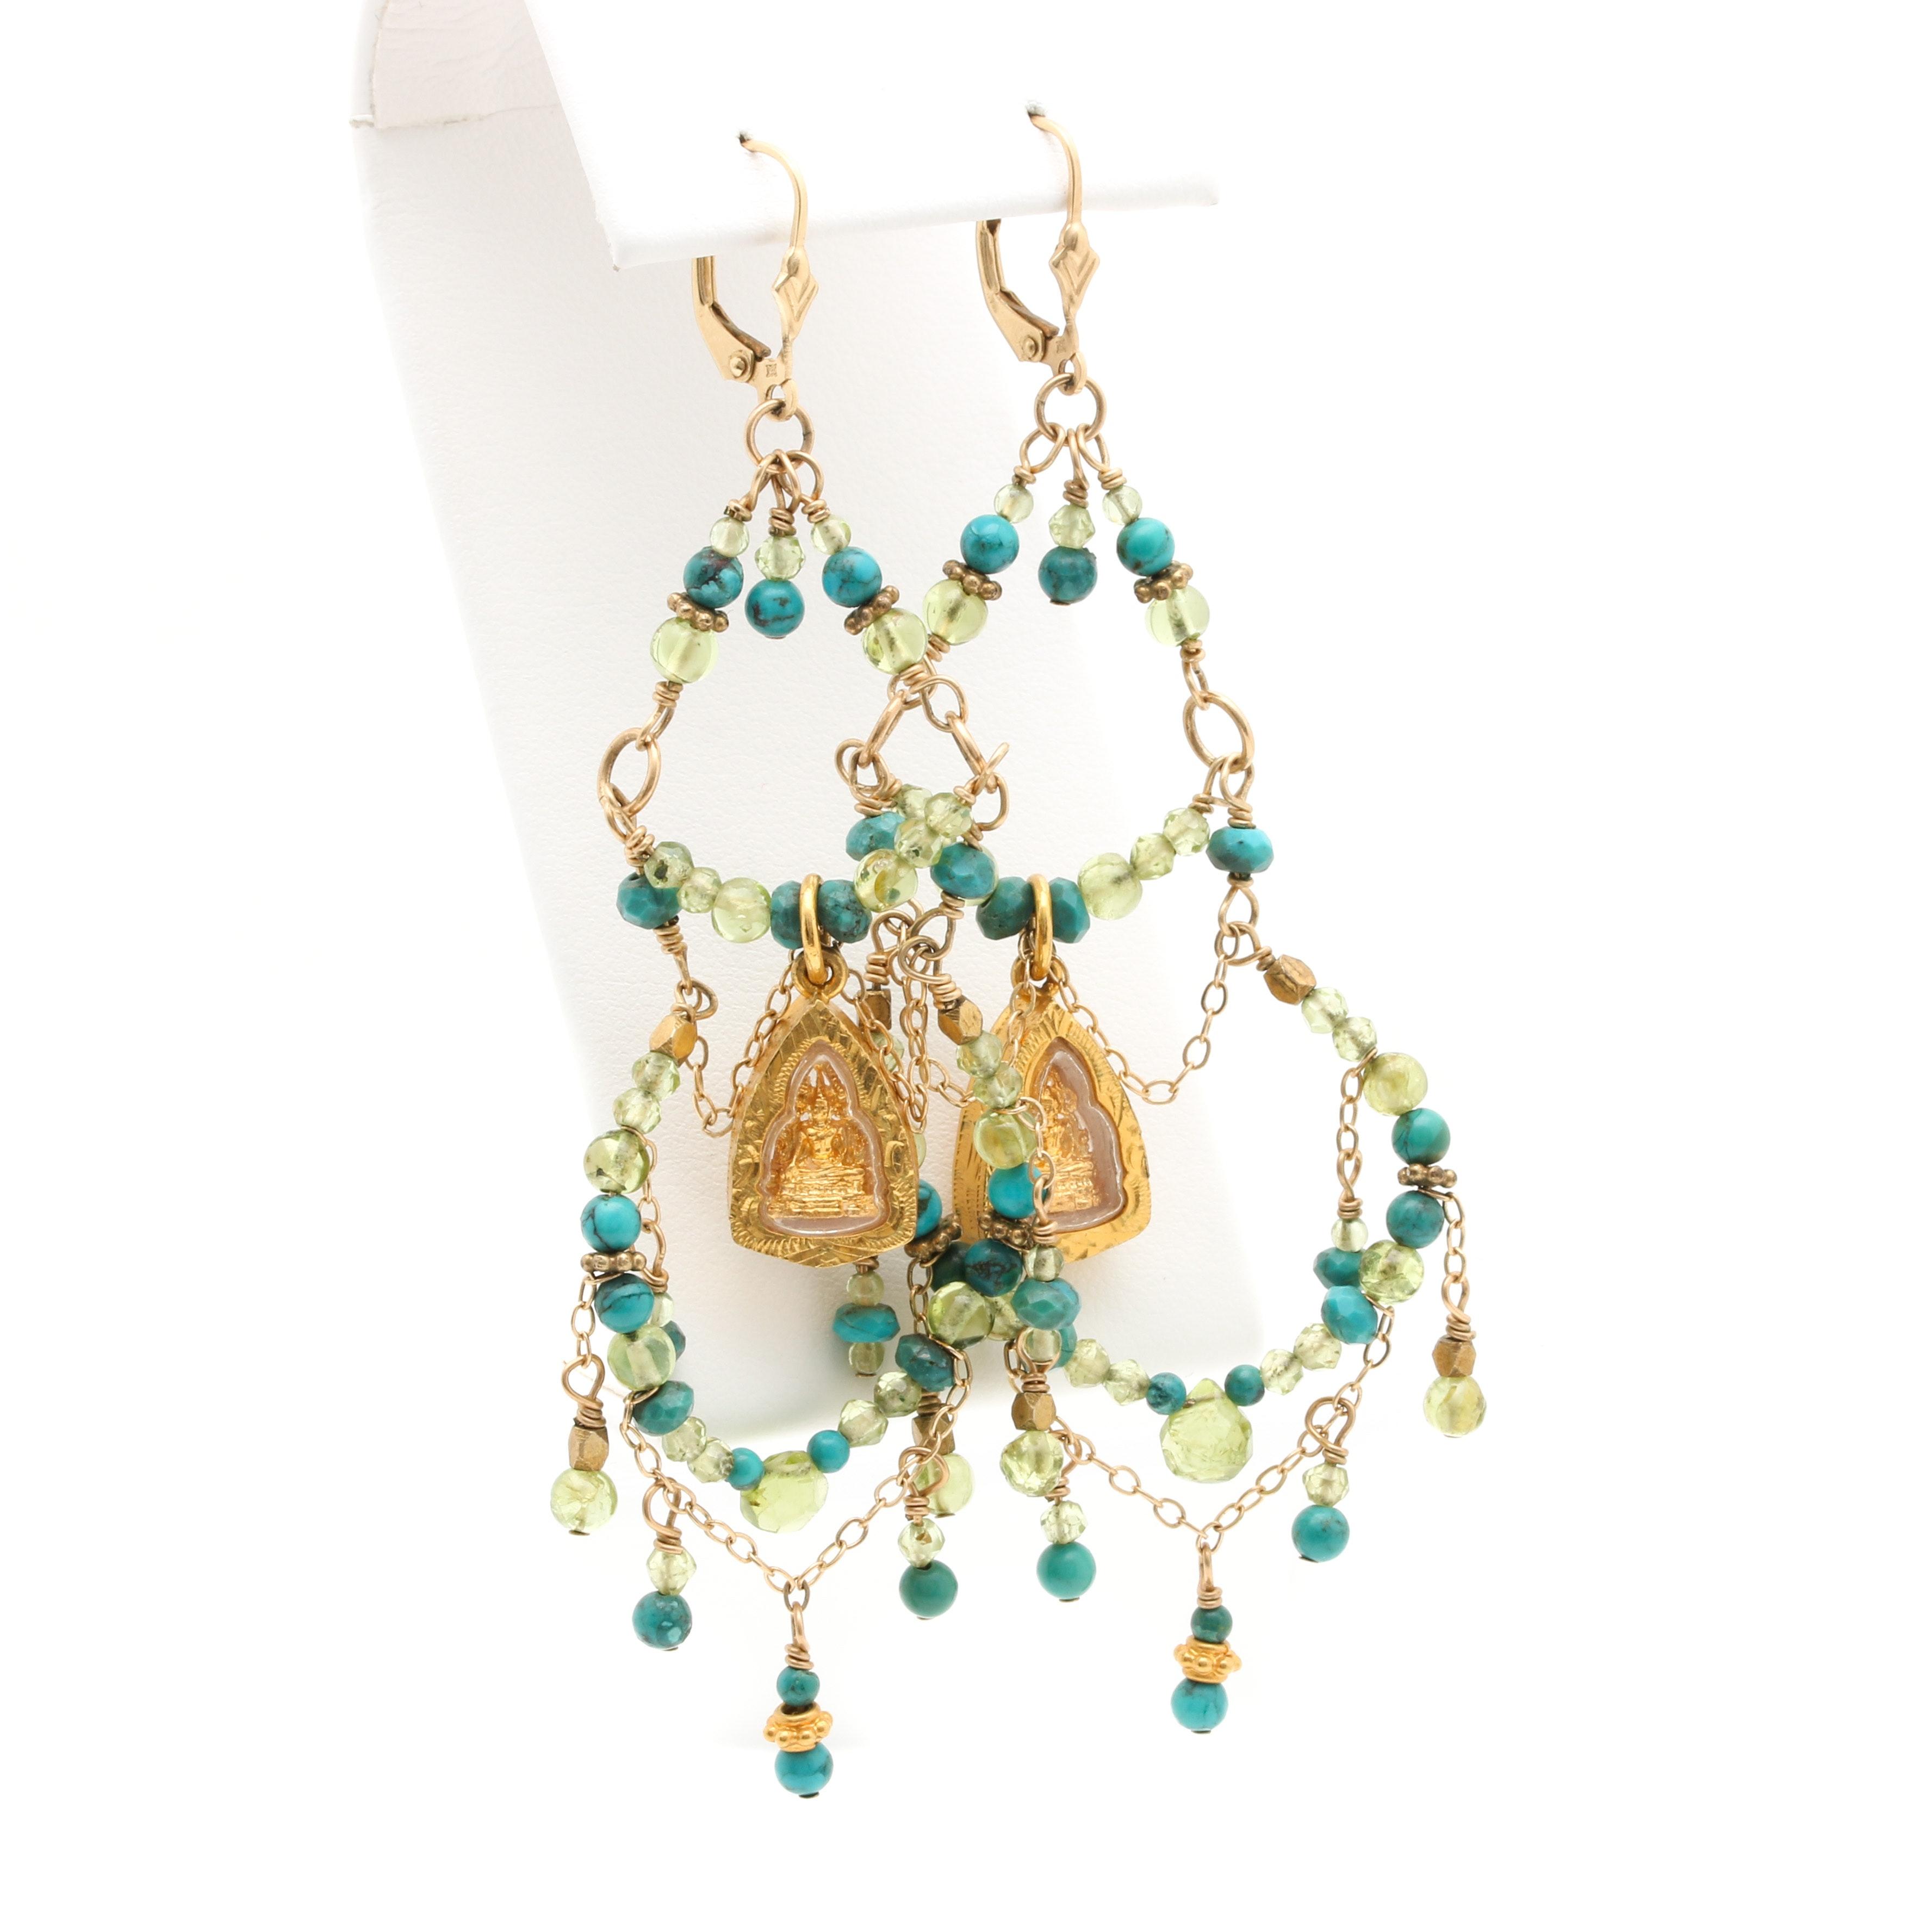 14K Yellow Gold Turquoise and Peridot Beaded Earrings